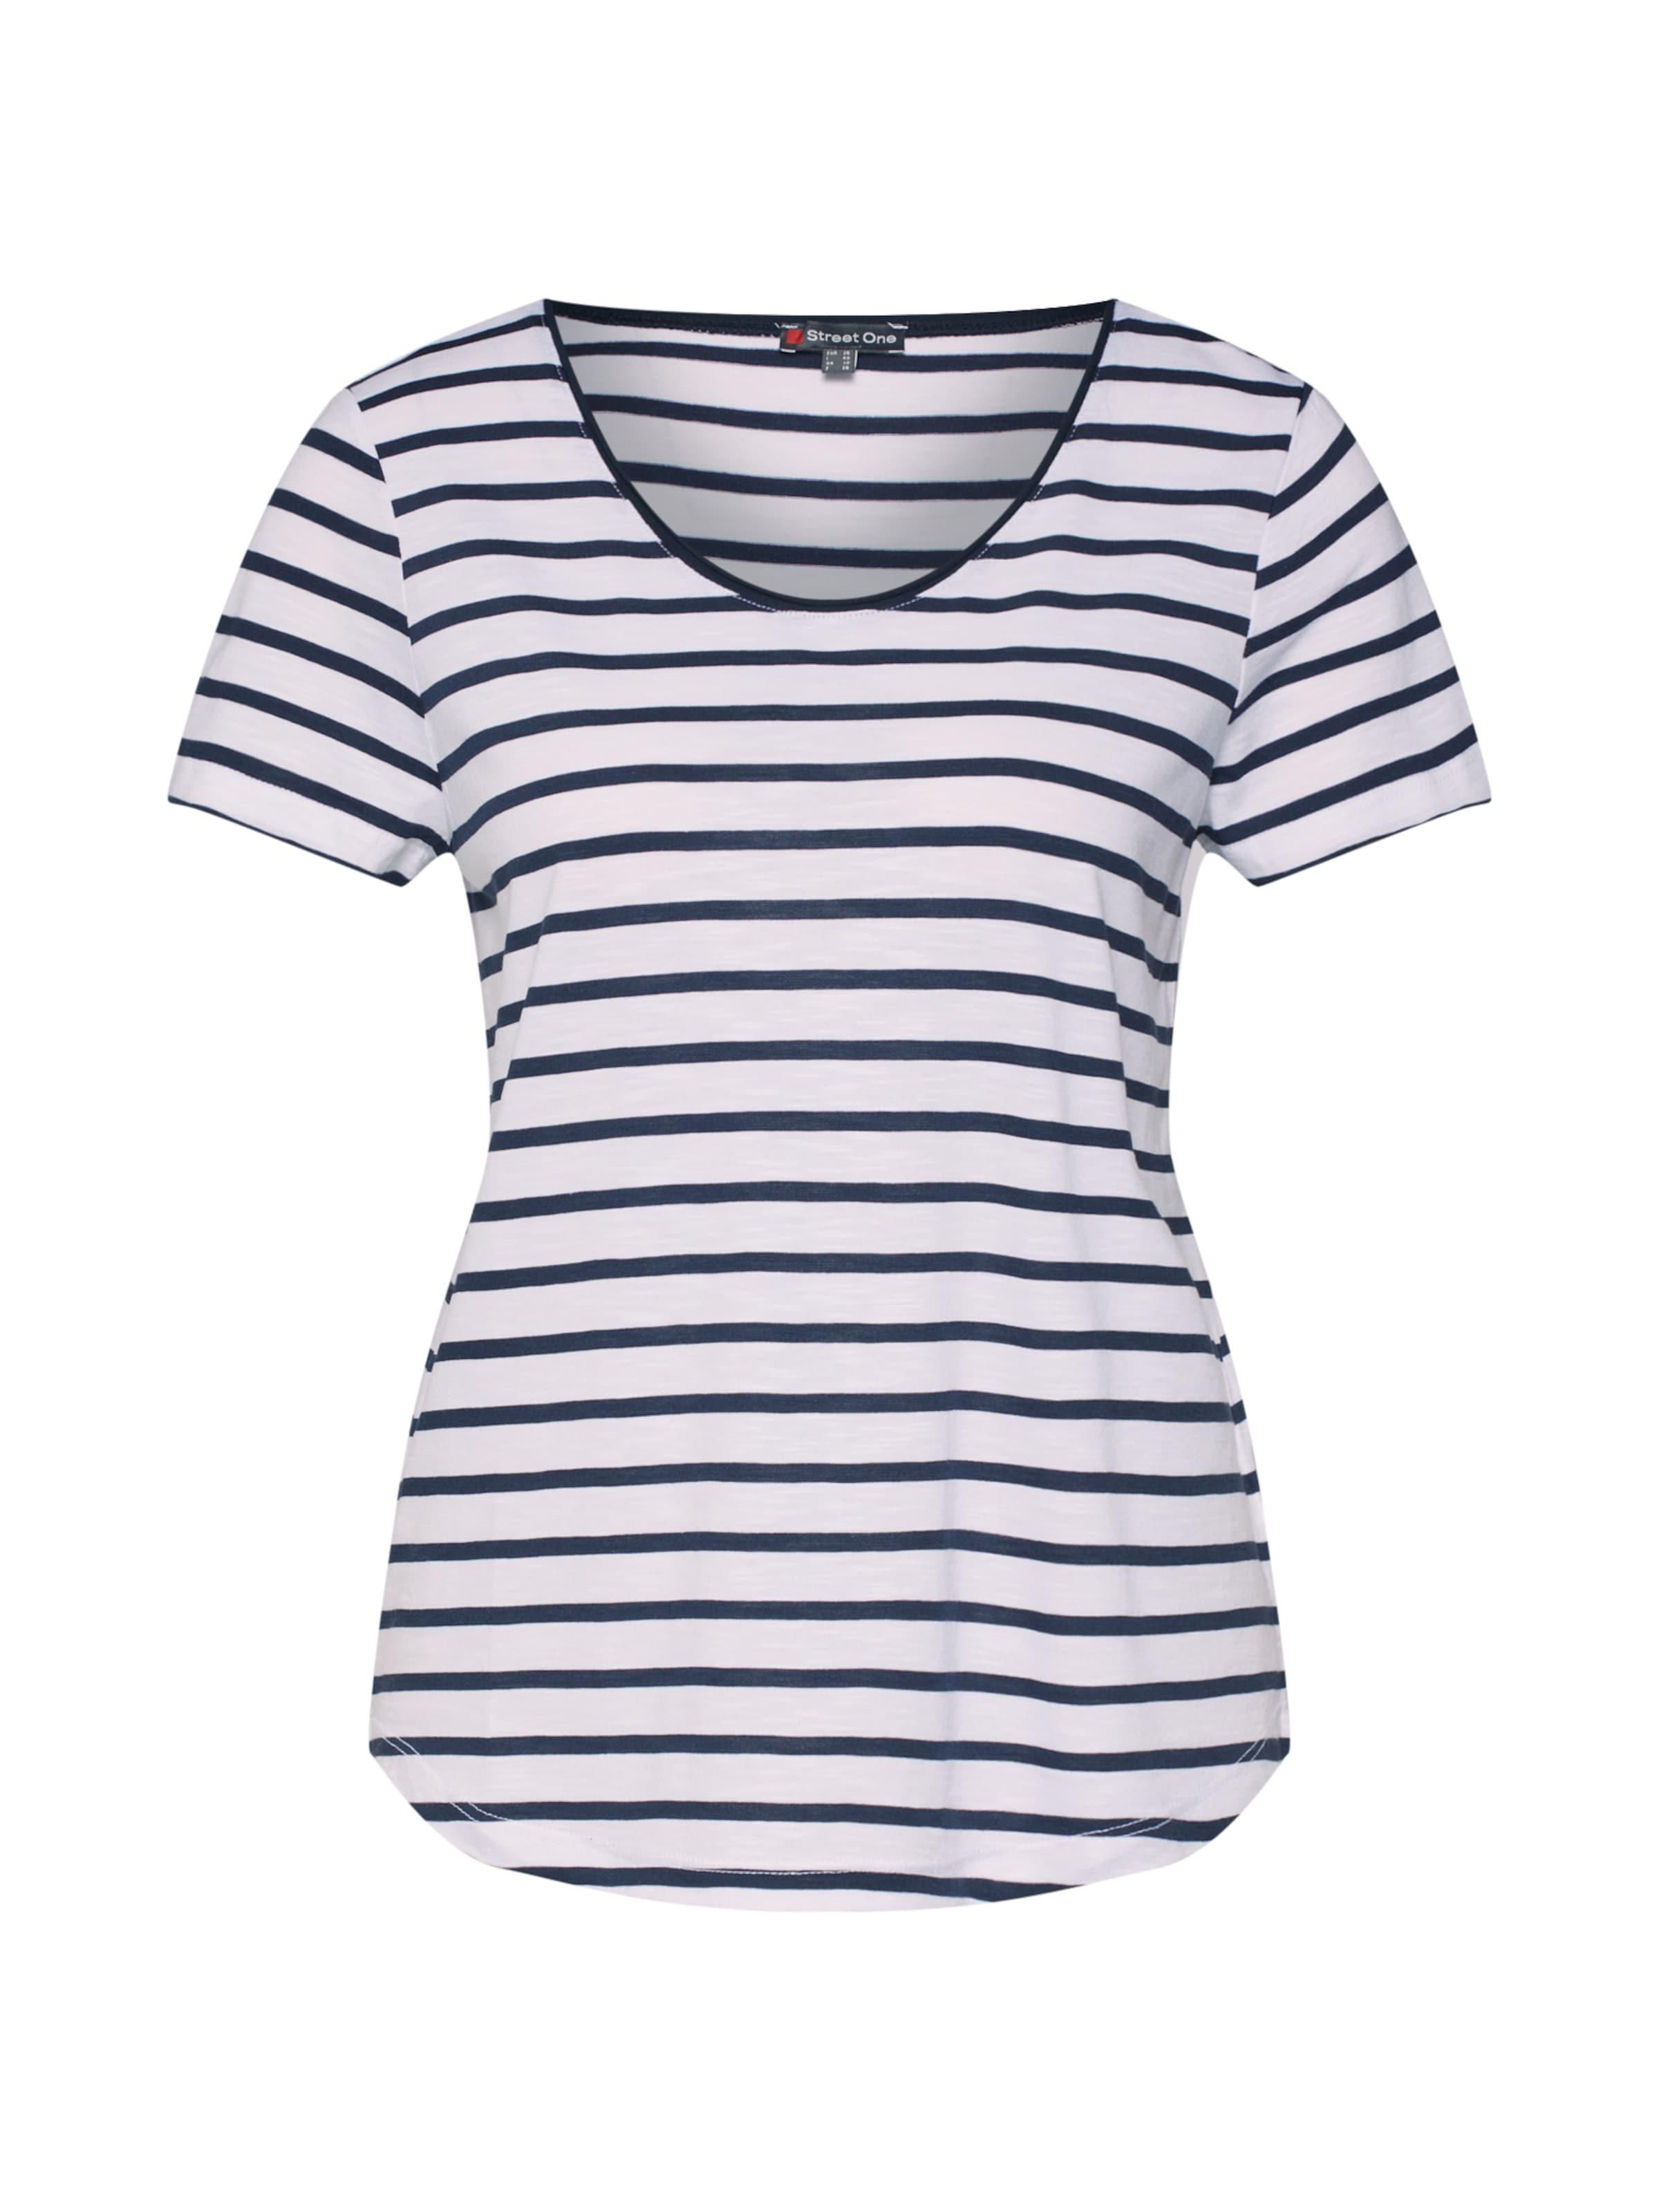 Qr One Bleu Street FoncéBlanc 'ltd shirt Gerda' En T R54qS3ALcj